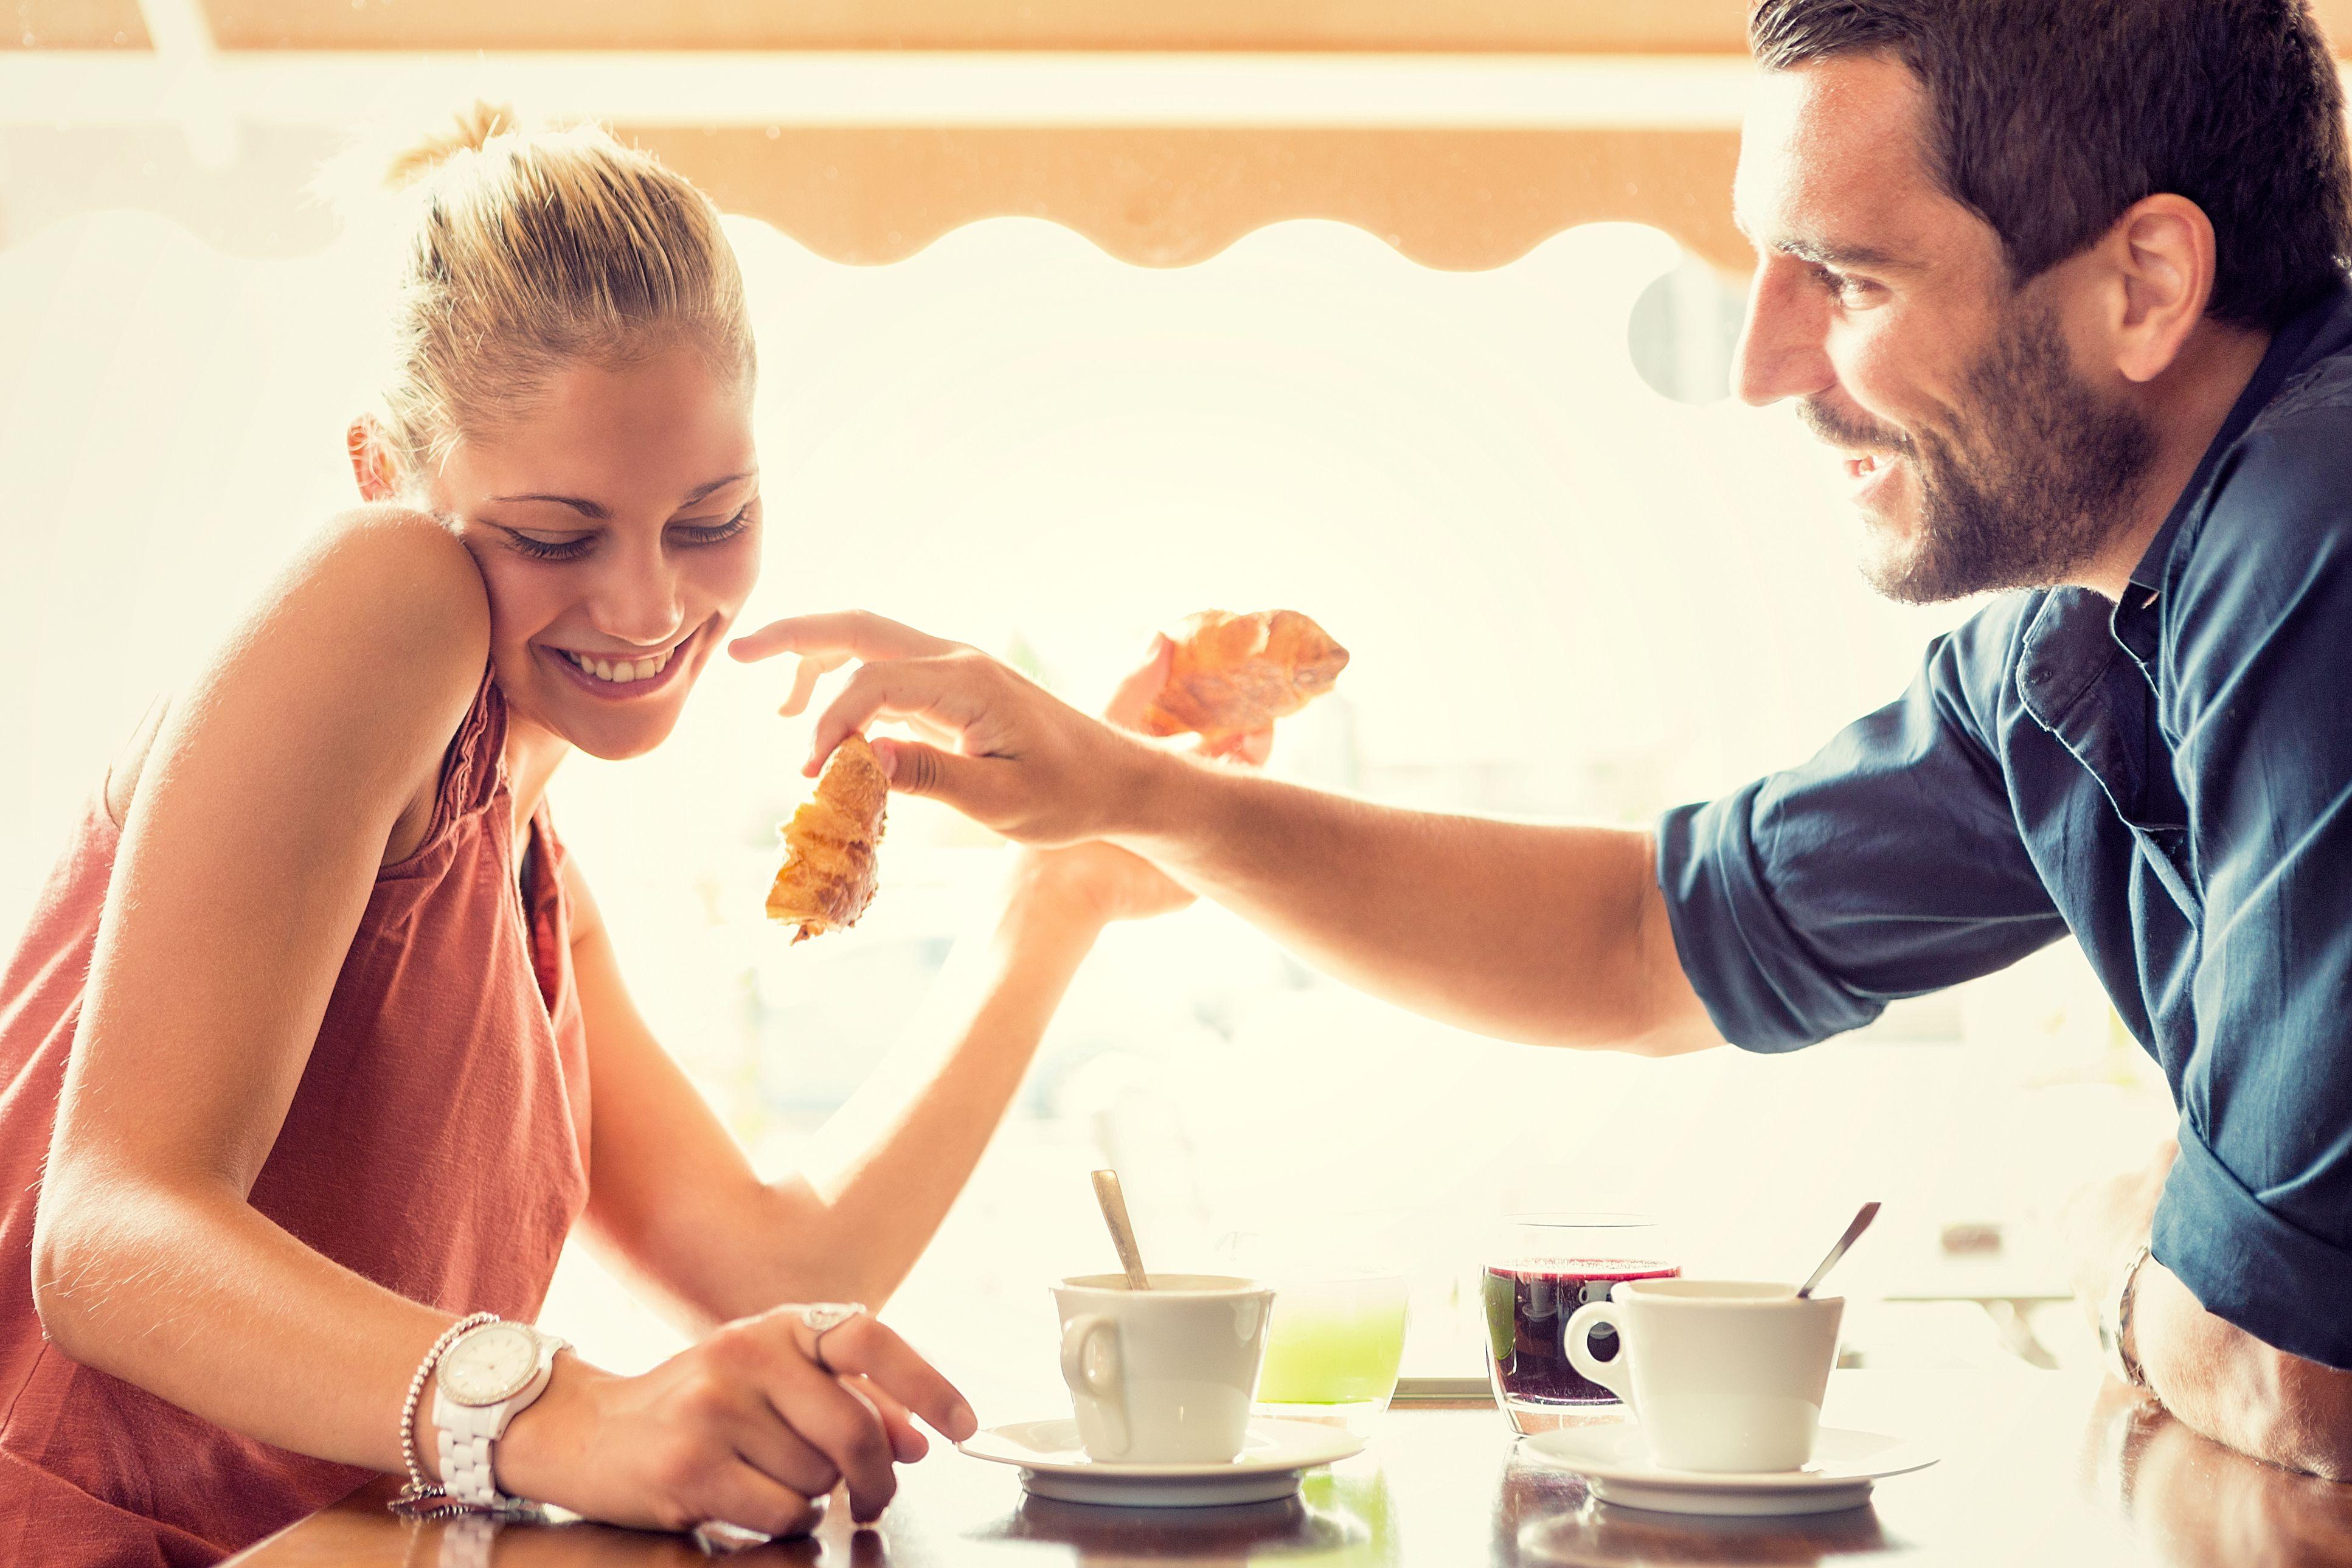 flirting on a first date